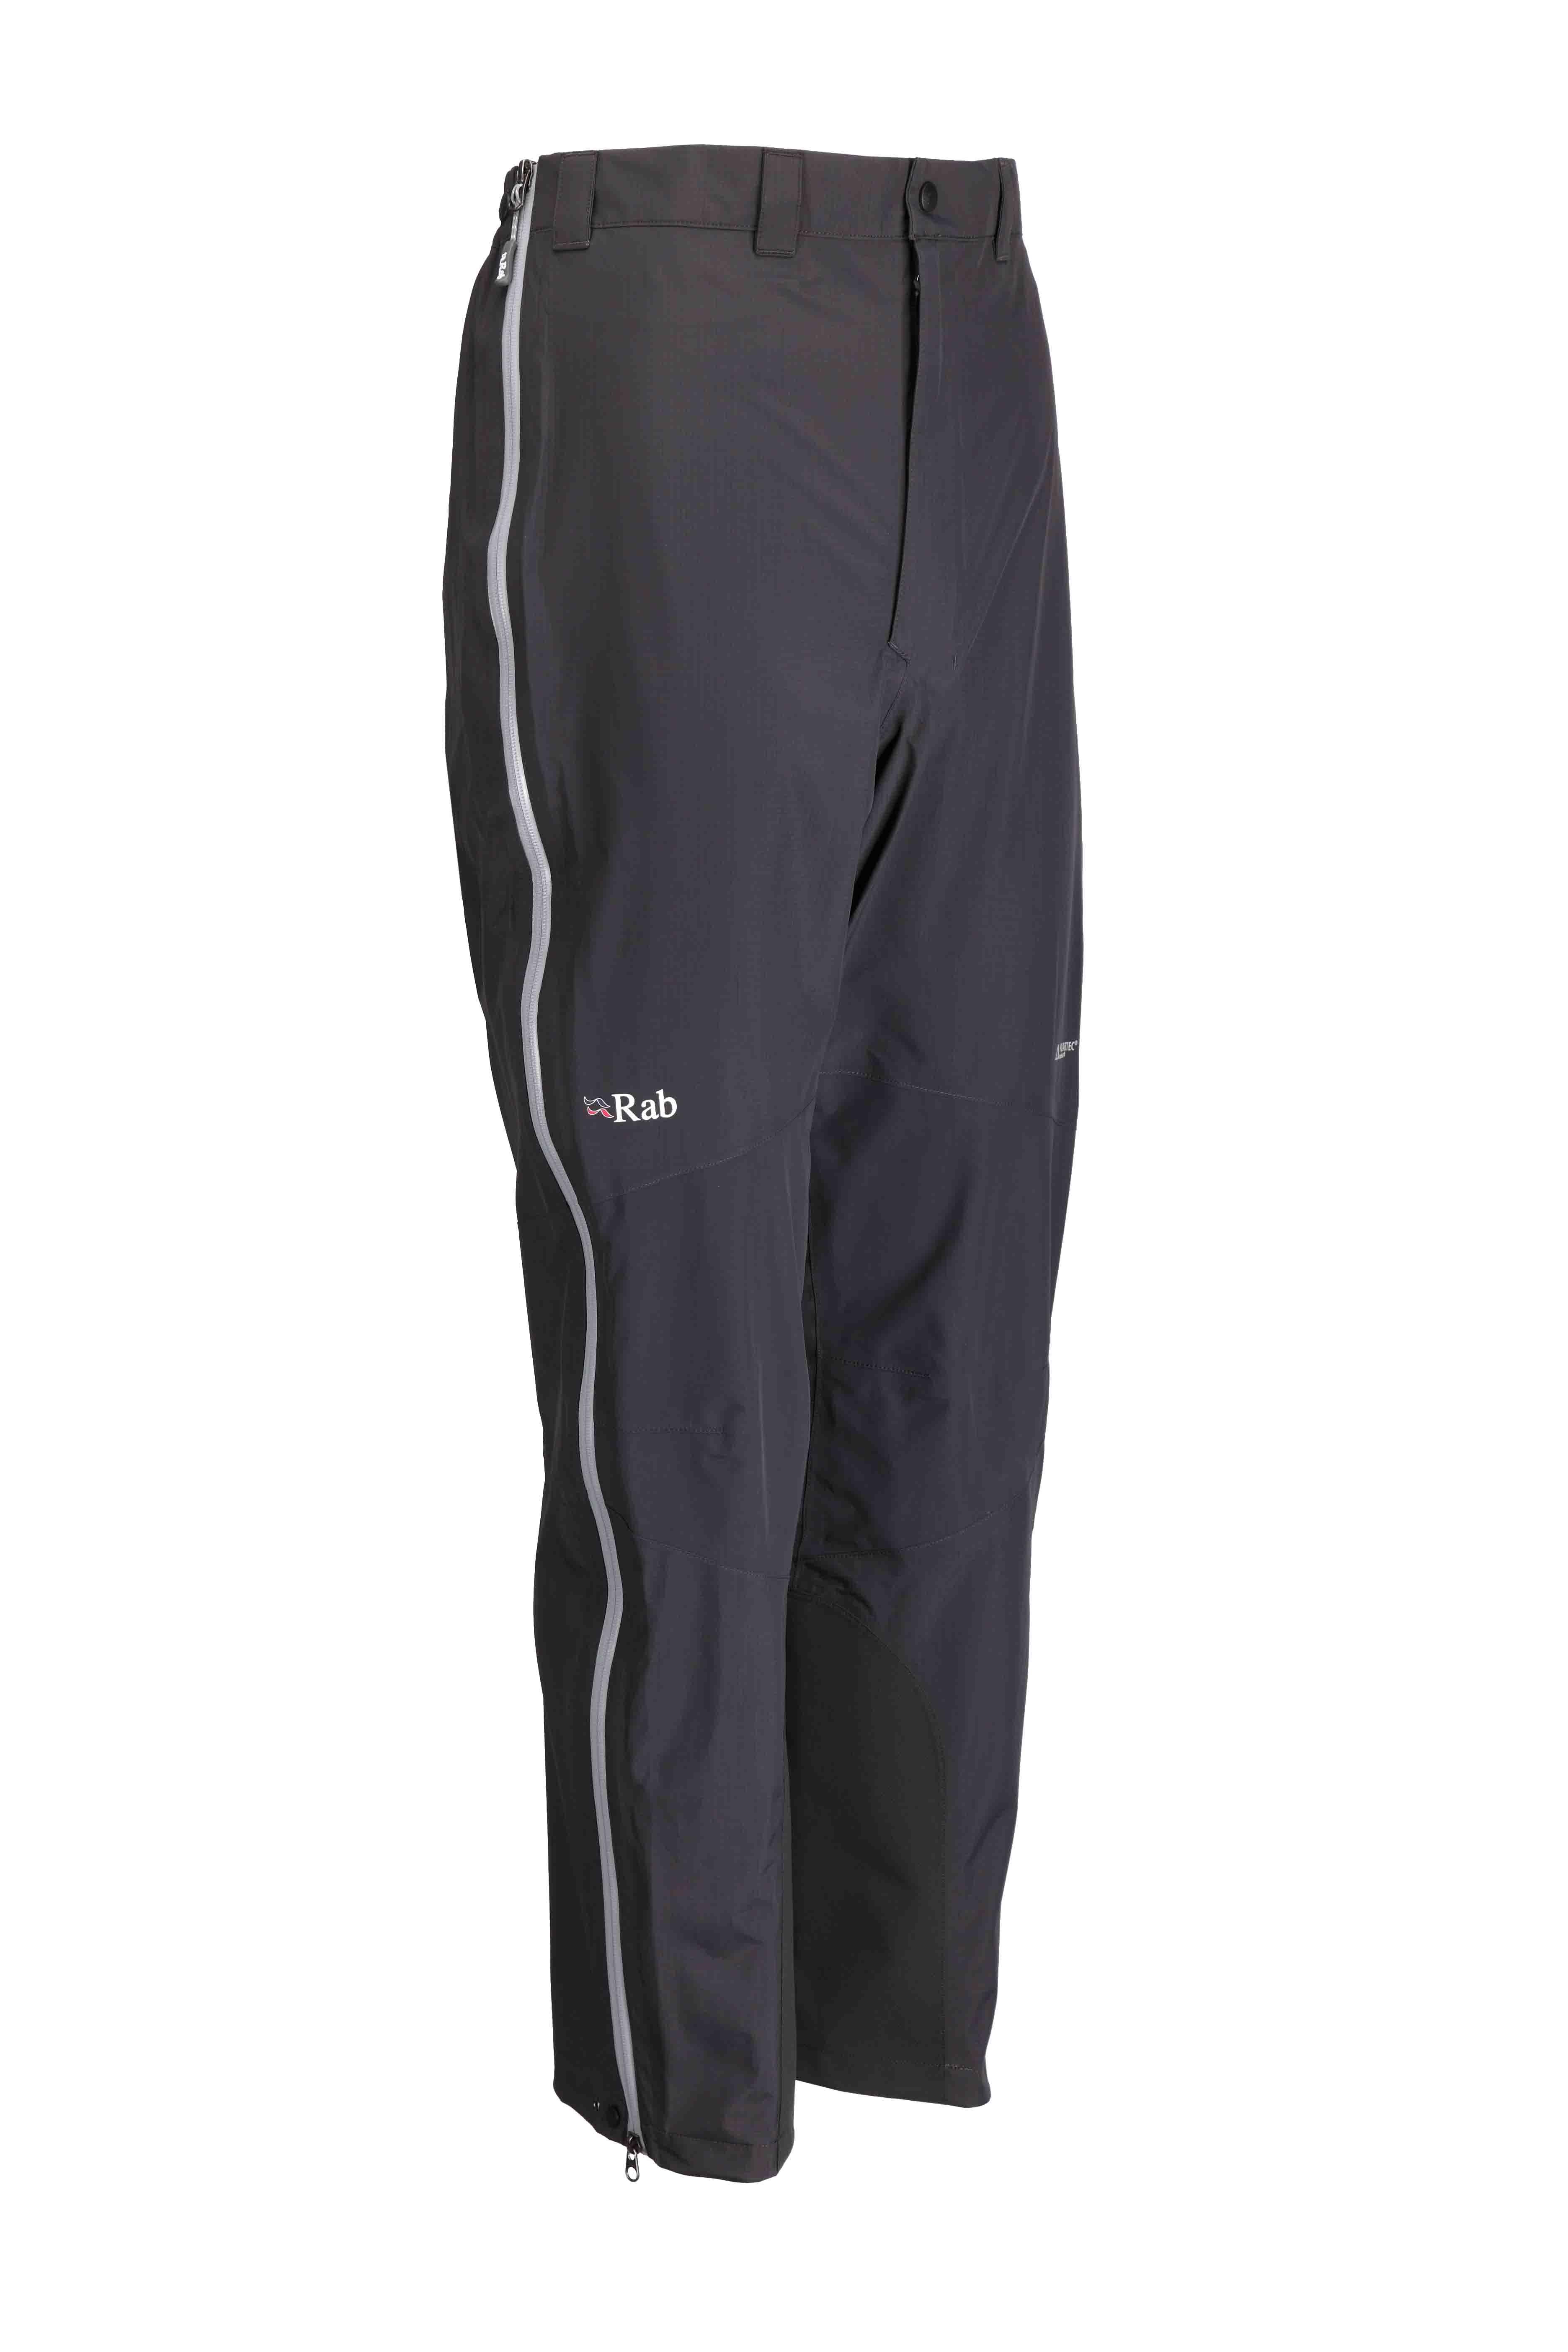 Rab Nexus Pants with Polartecr NeoShellr